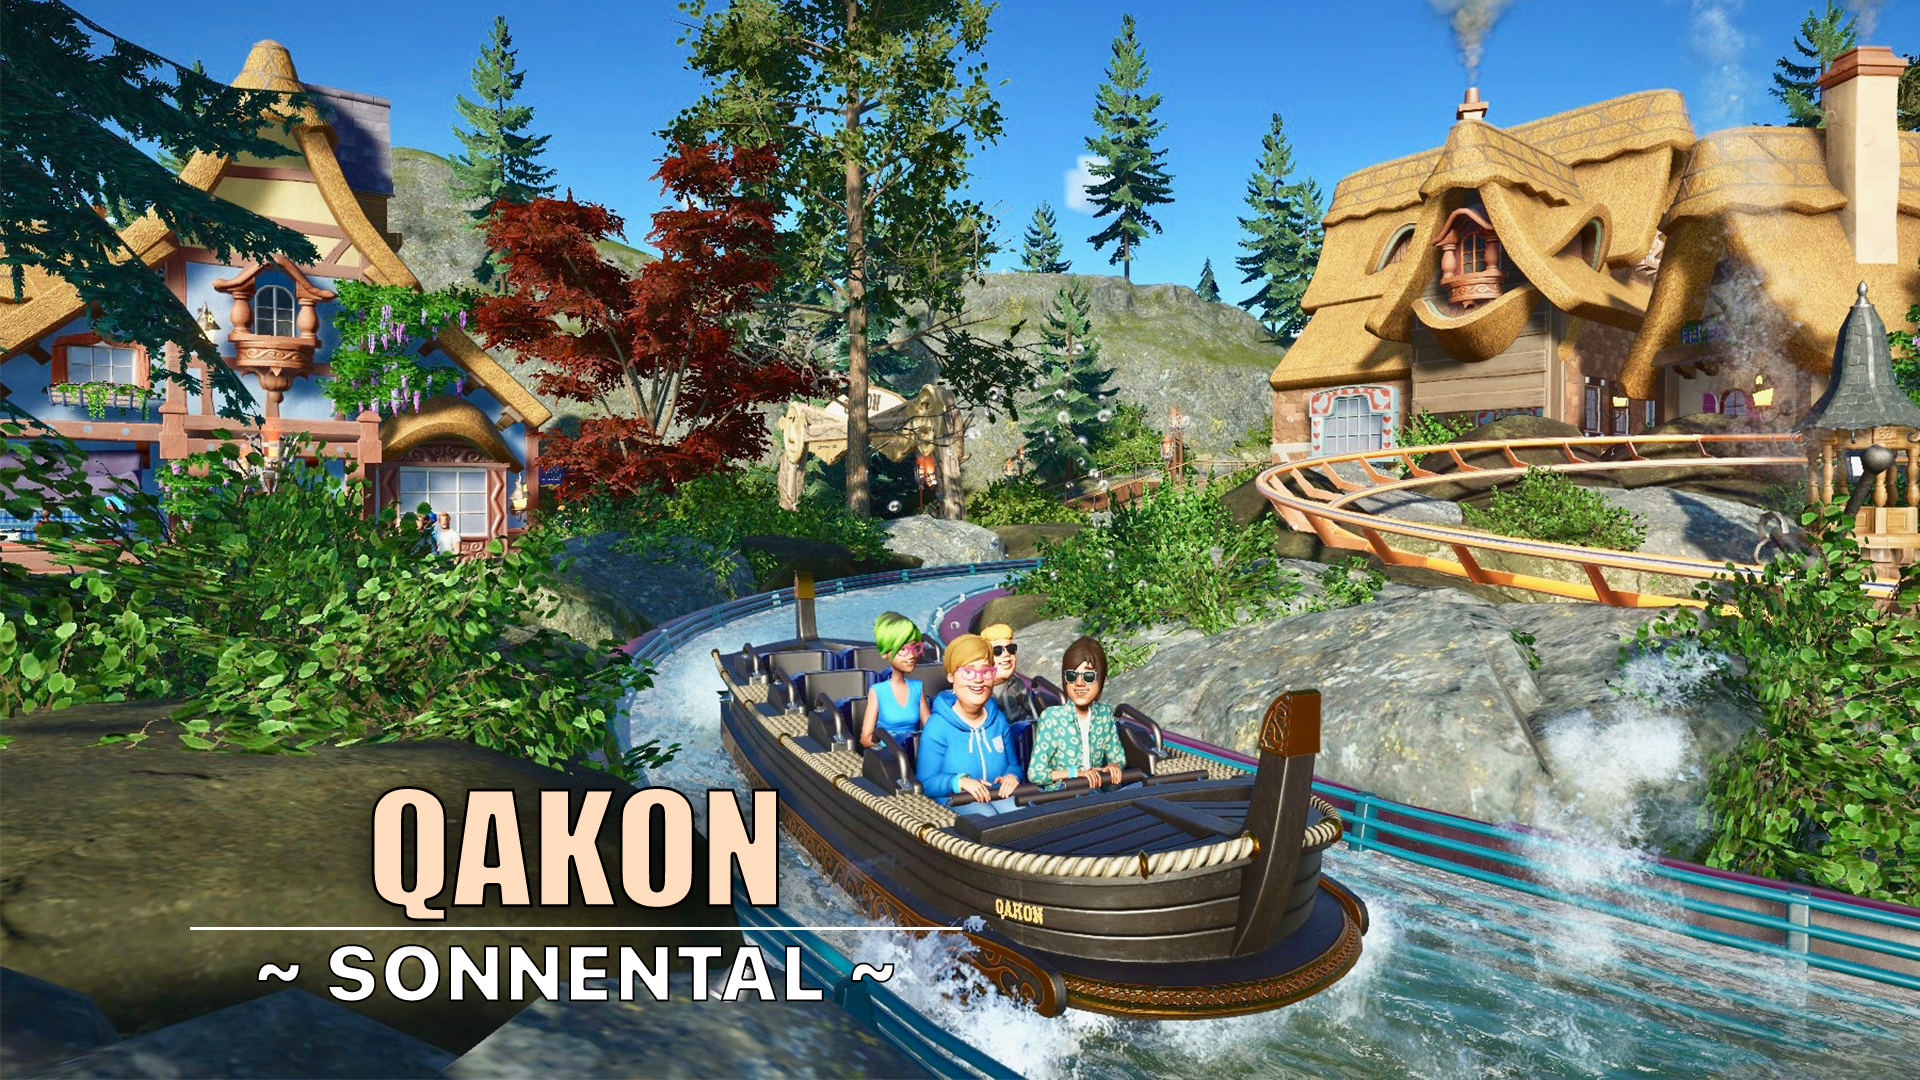 Qakon water coaster